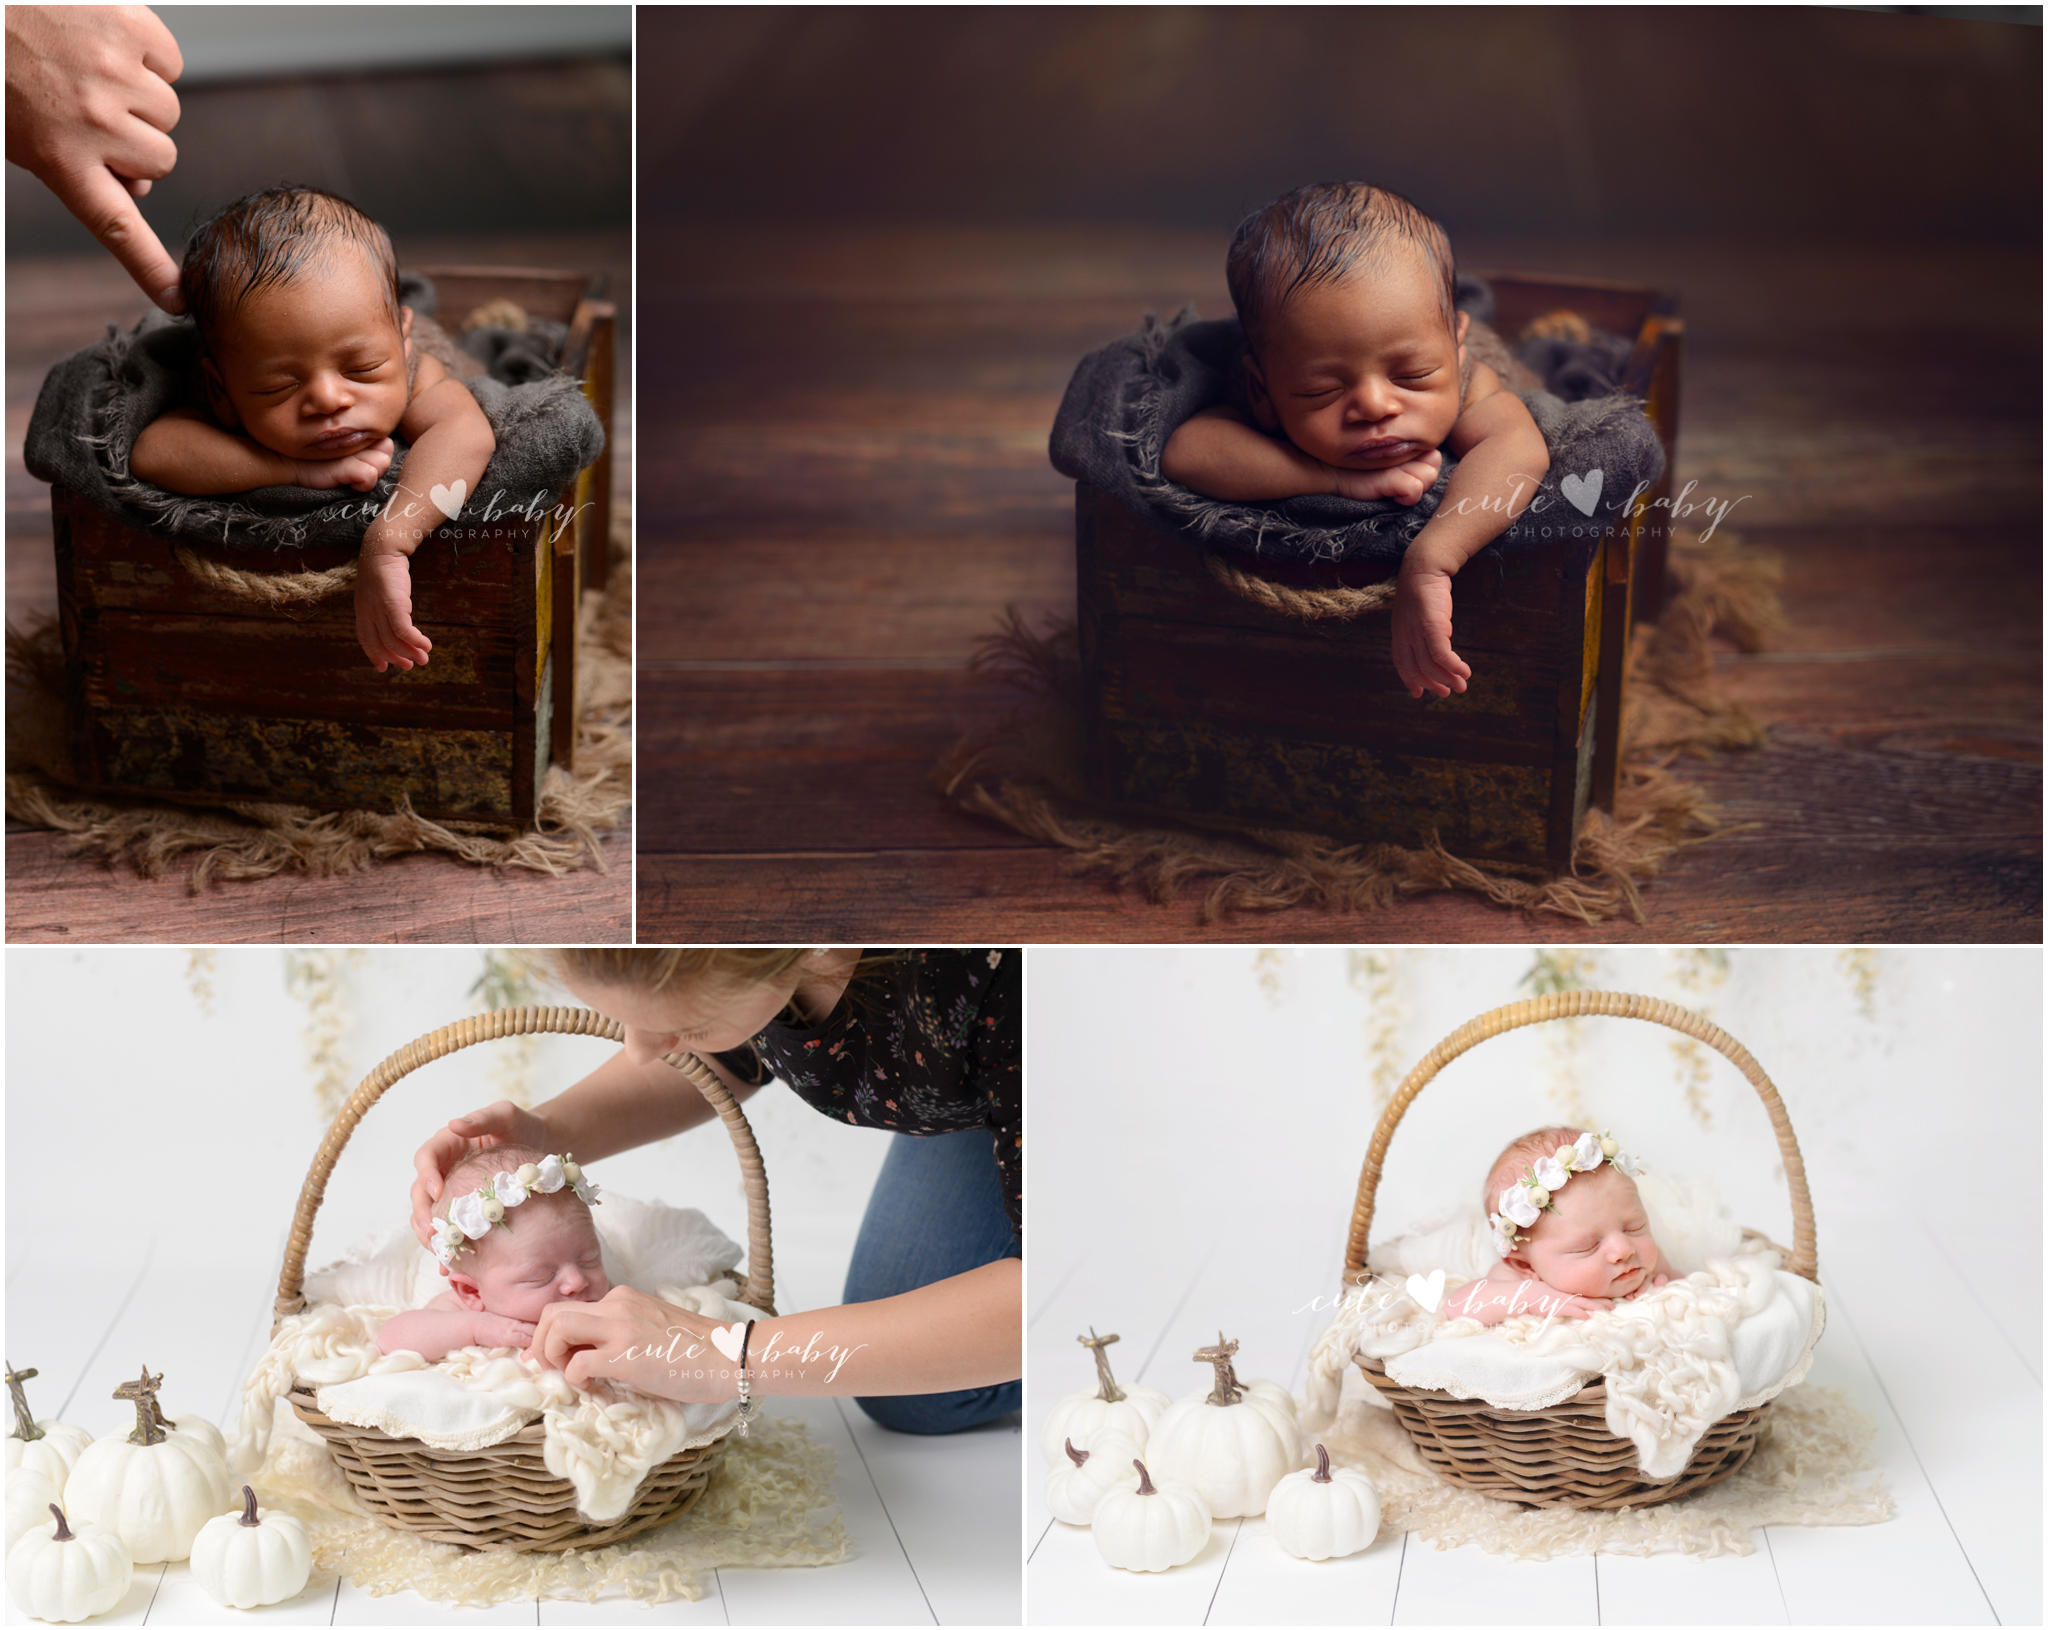 Newborn Safety CuteBaby Photography, Newborn Photography Manchester, Newborn Pictures Cheshire